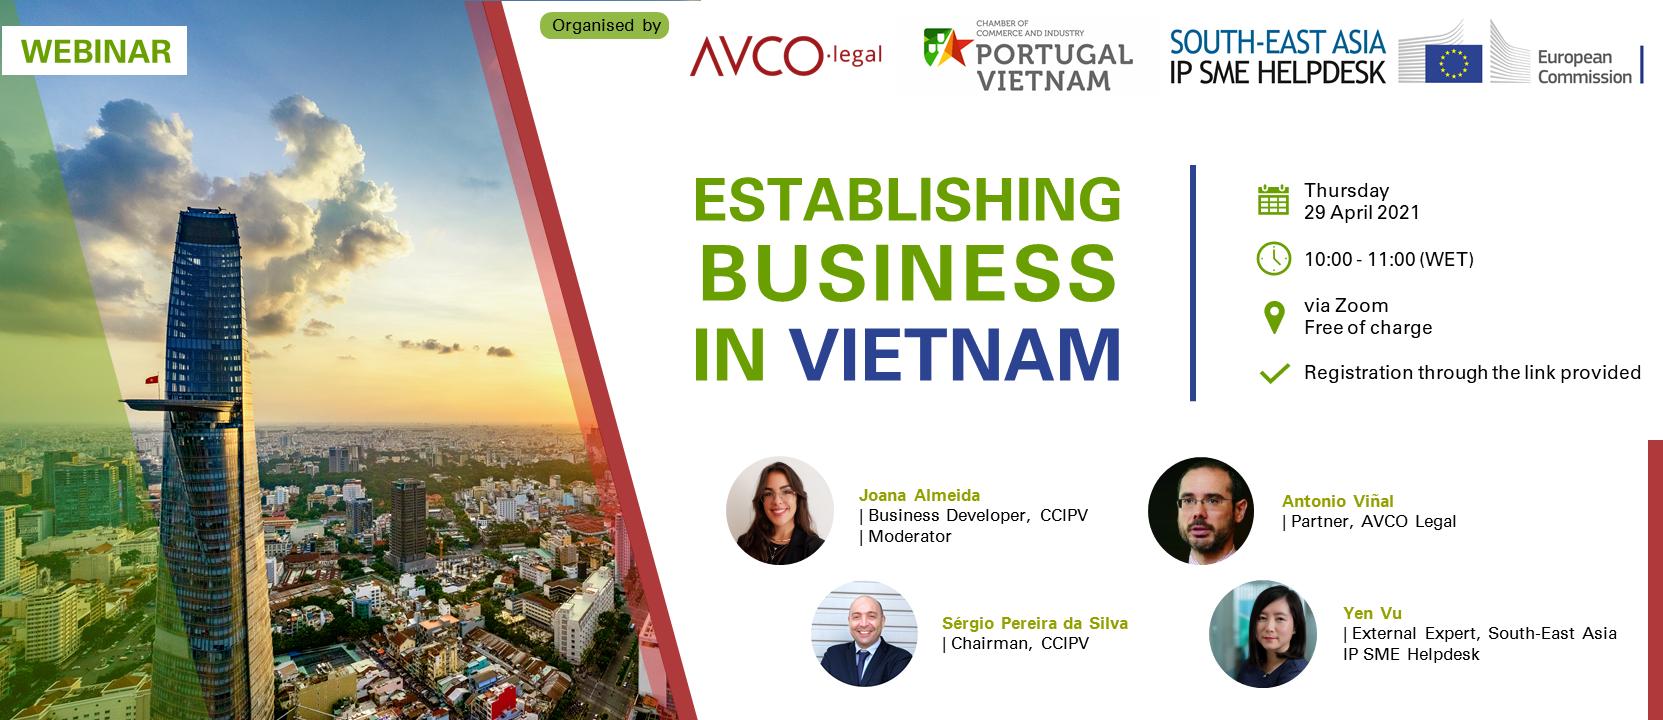 Webinar: Establishing Business in Vietnam (Co-Organised with CCIPV & AVCO Legal)